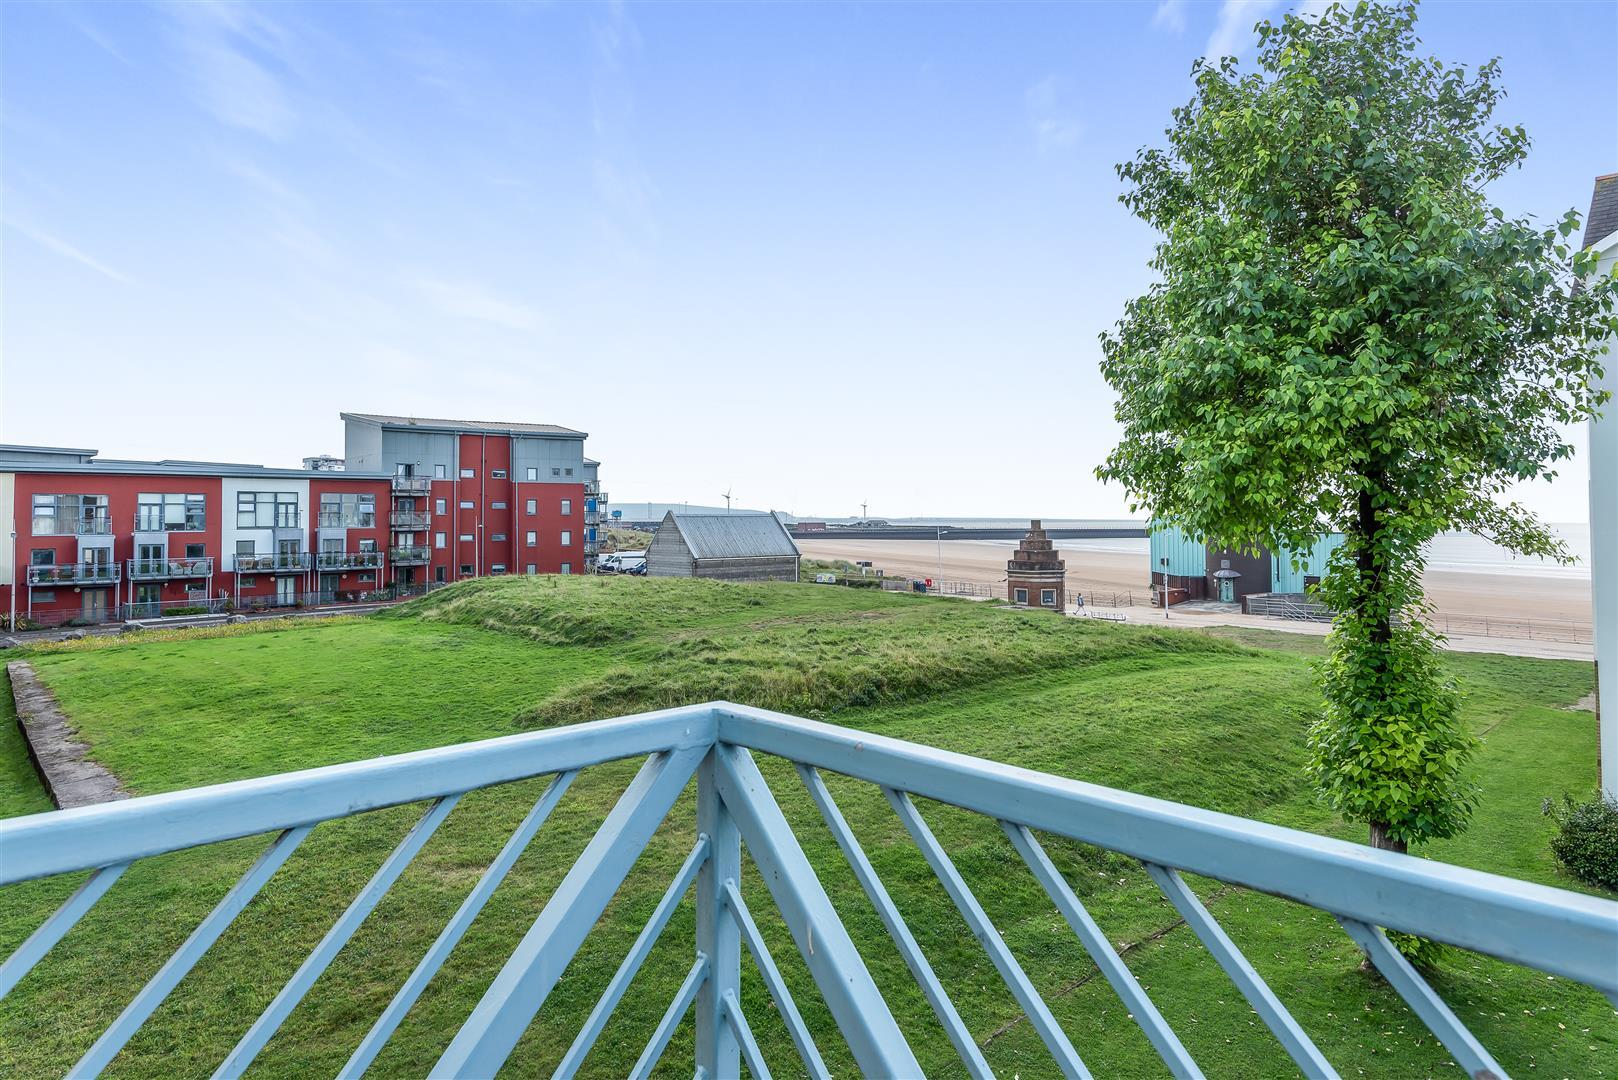 Argonaut House, Marina, Maritime Quarter, Swansea, SA1 1UB